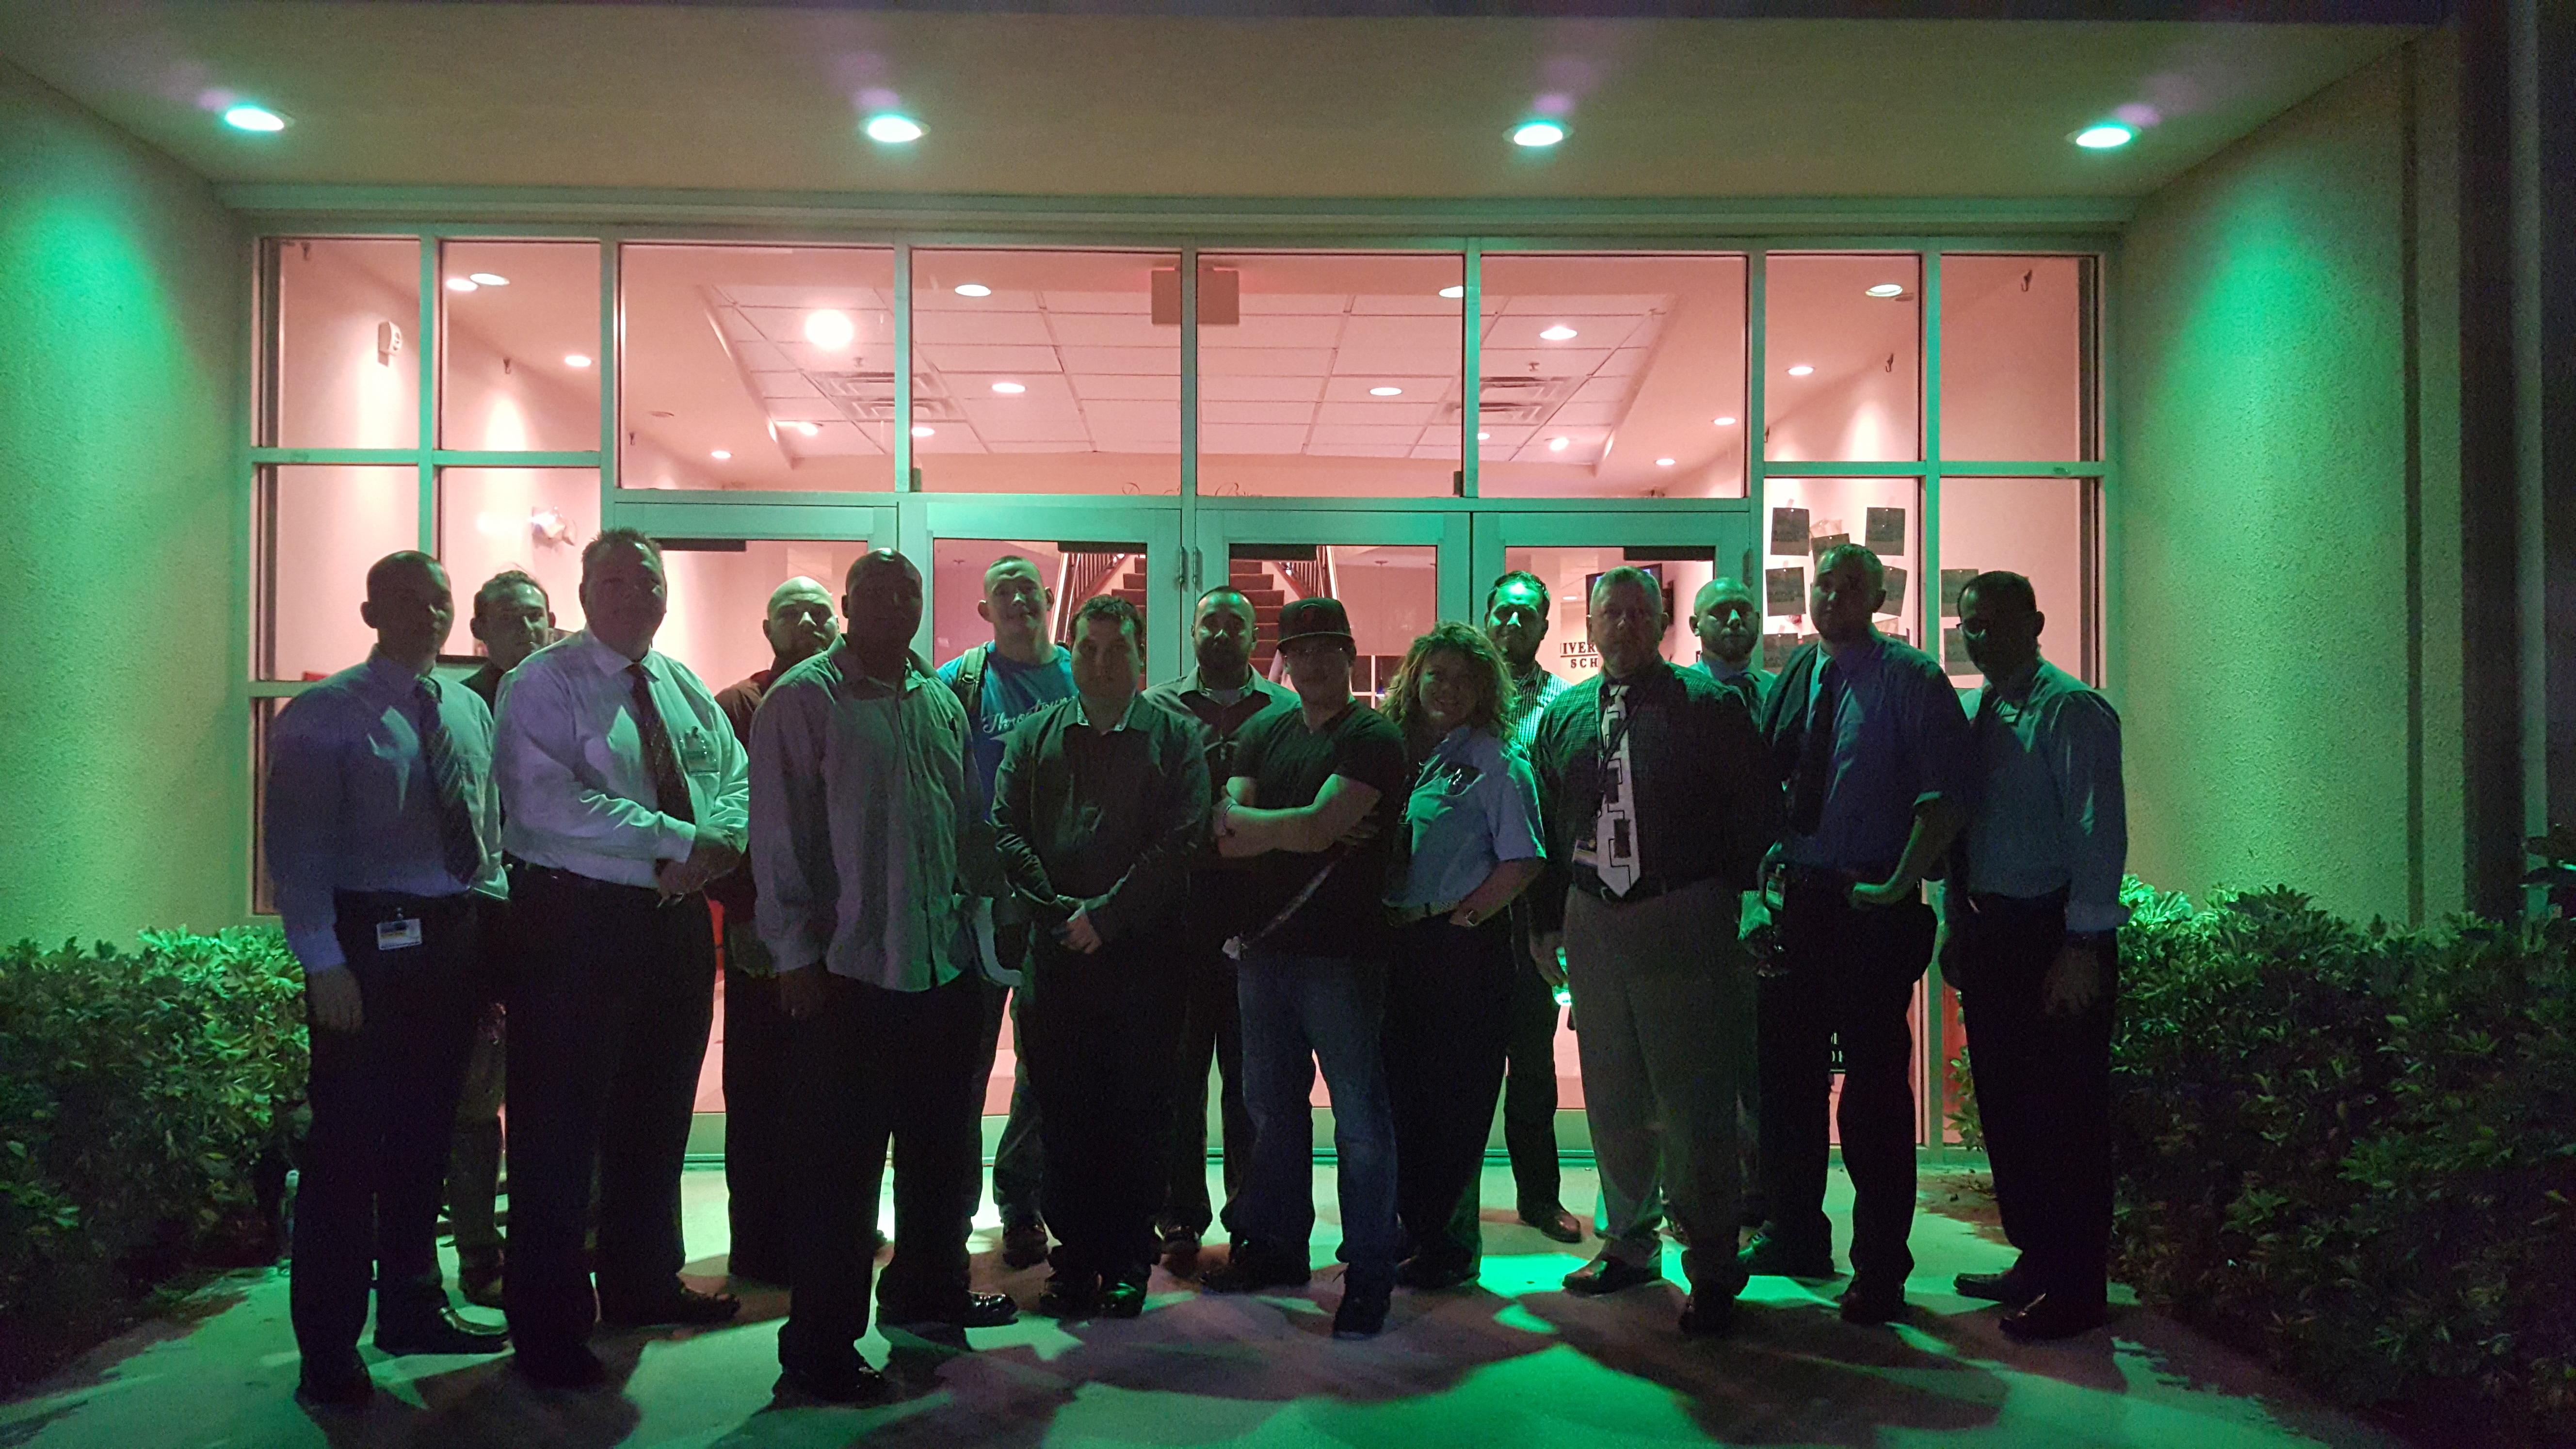 greenlight-vets-Nov.-2015 Original Pancake House West Palm Beach